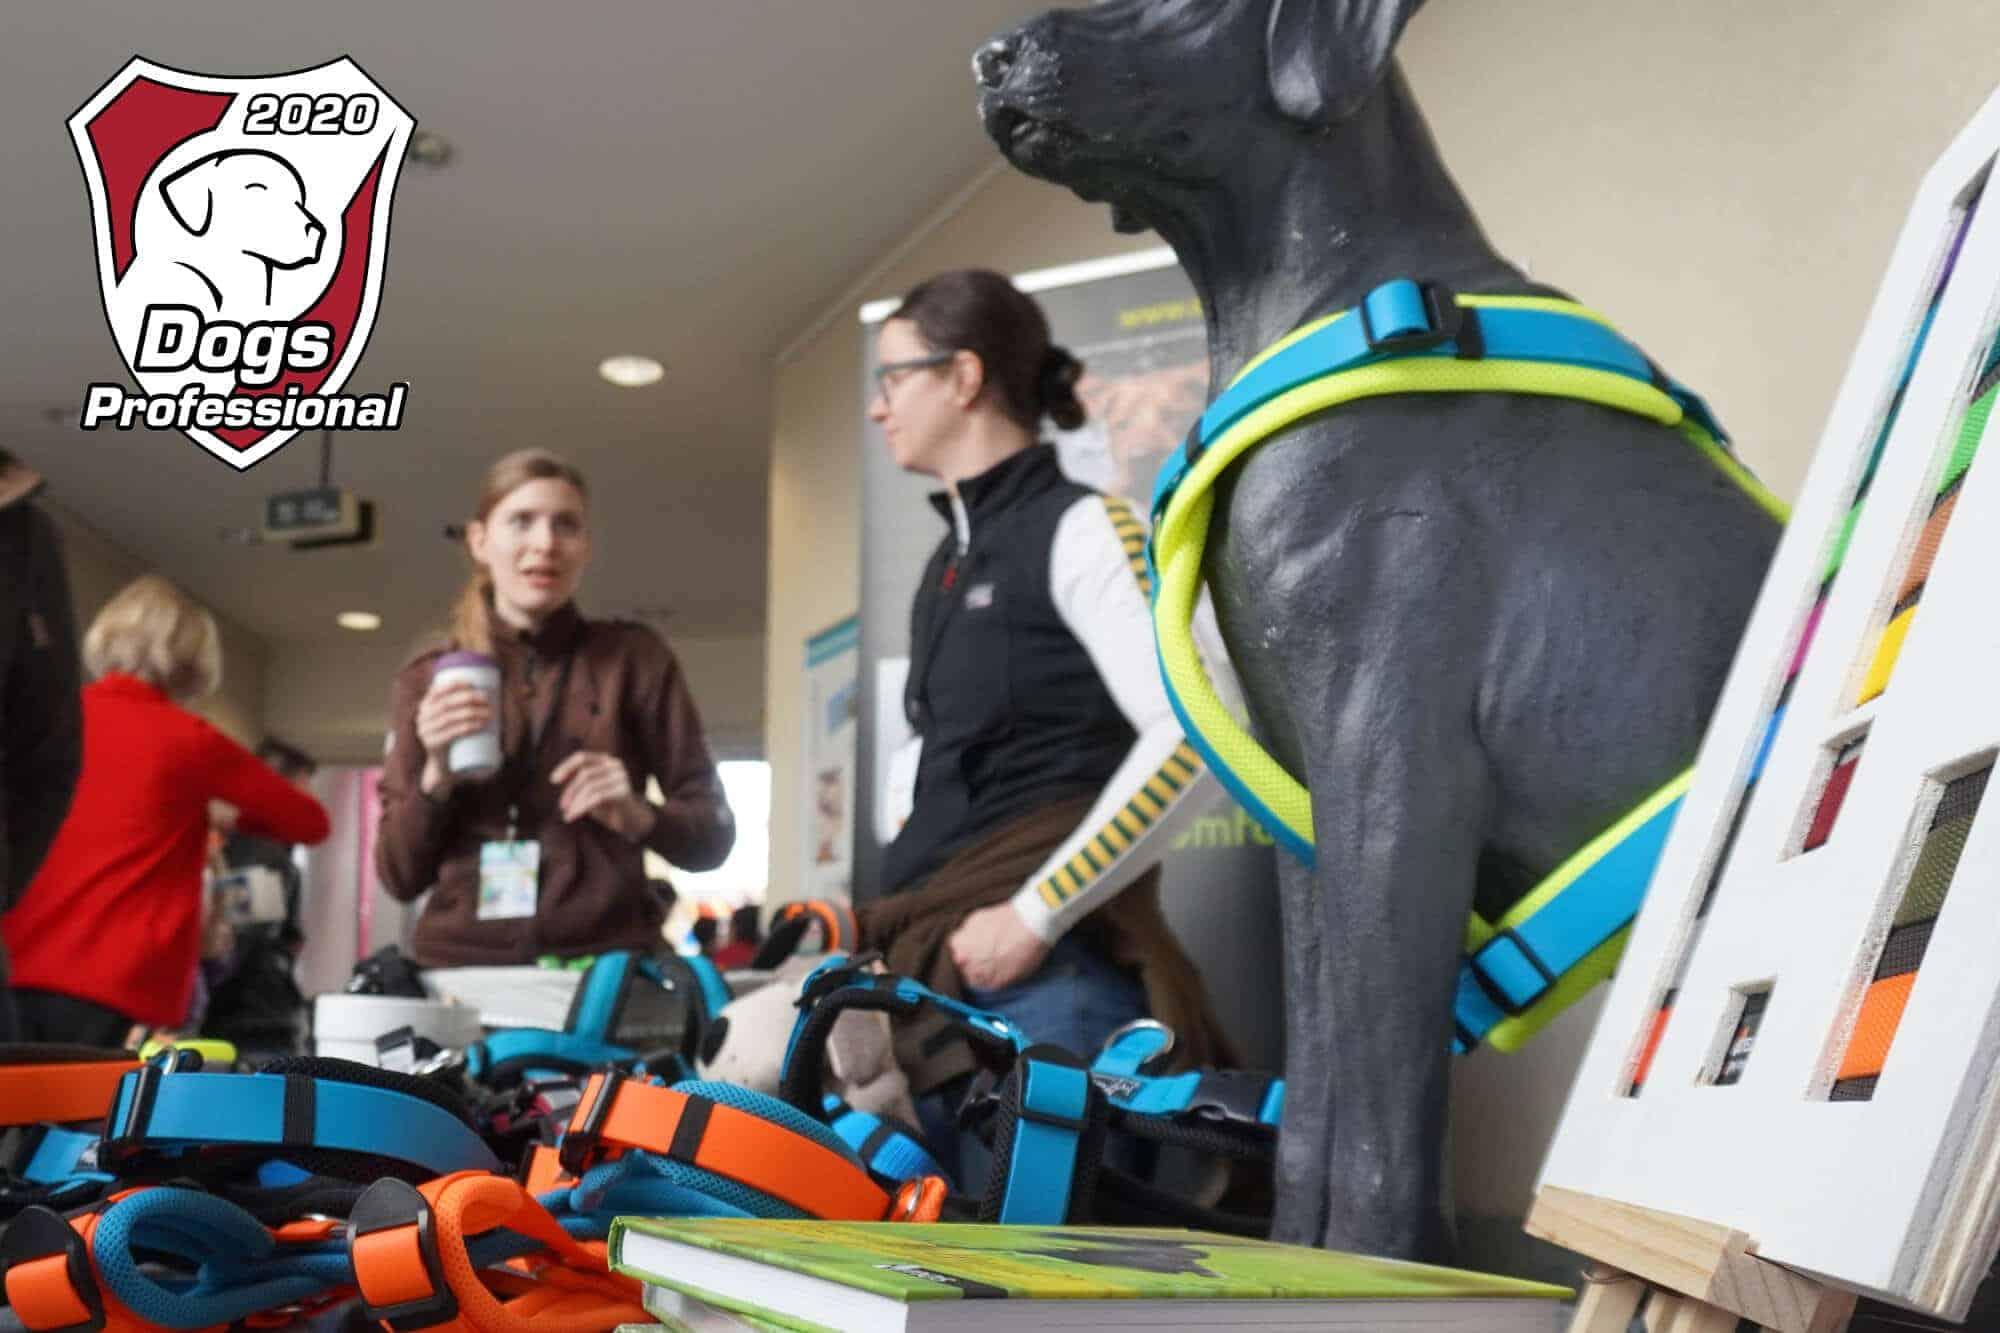 dogs professional 2020 hundetrainerkongress samstag 24